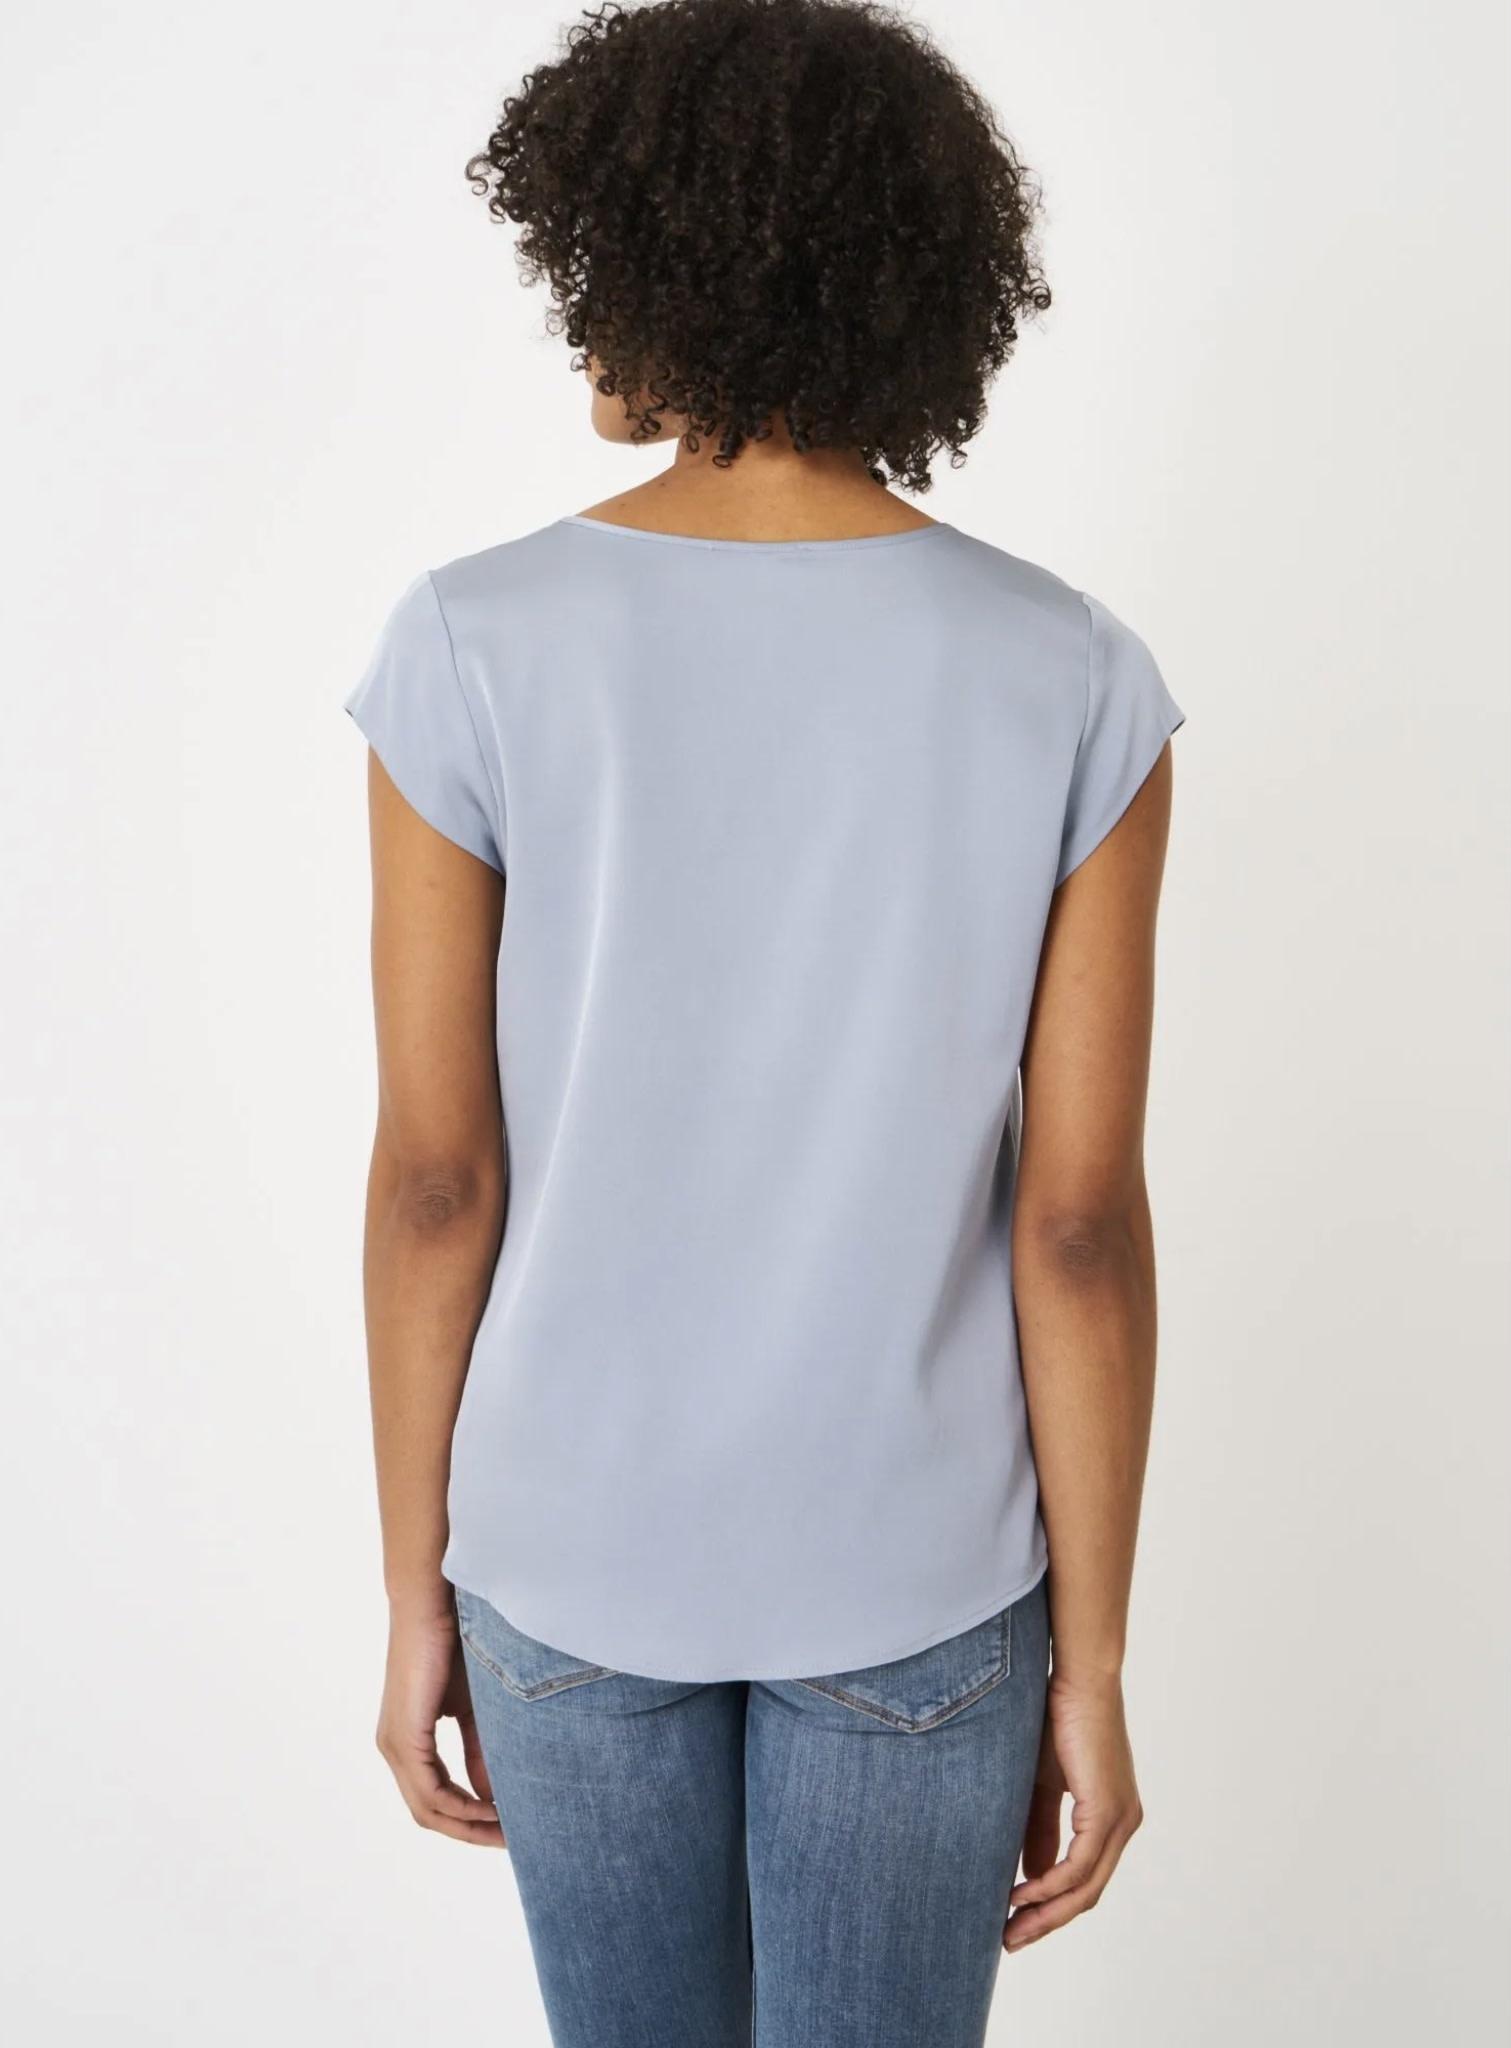 blouse repeat 600003-6